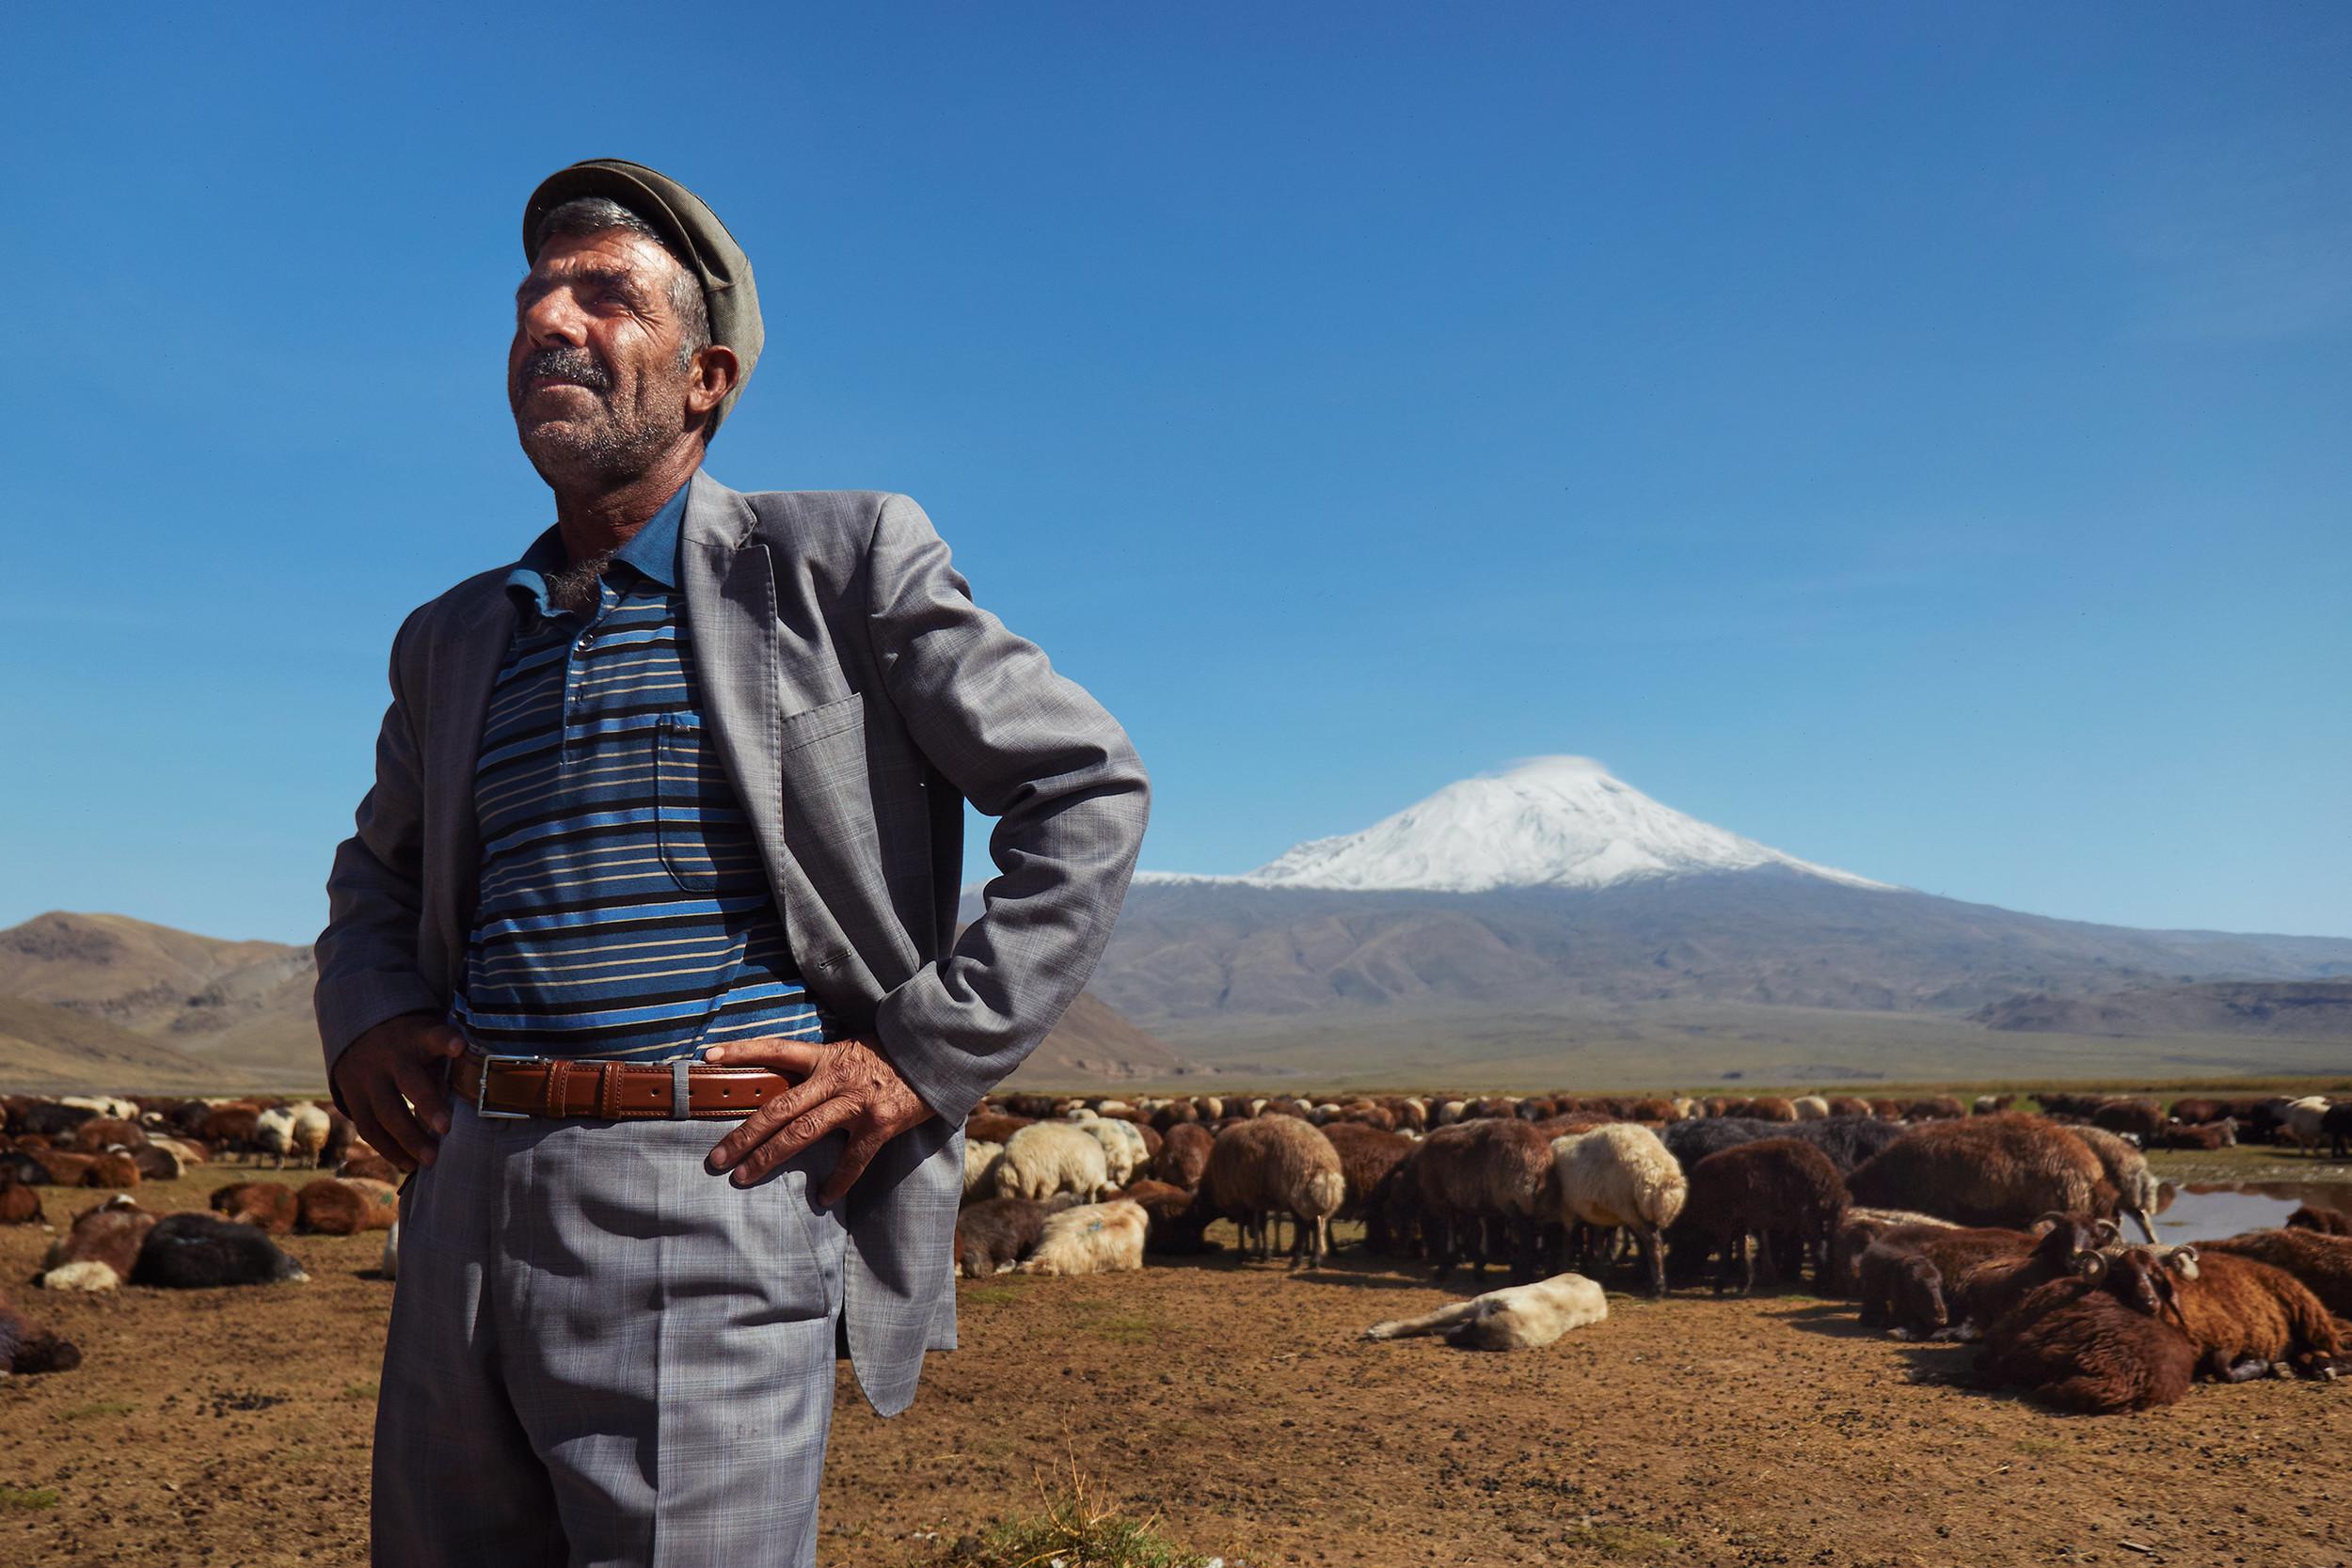 Mustafa standing near his flock of sheep